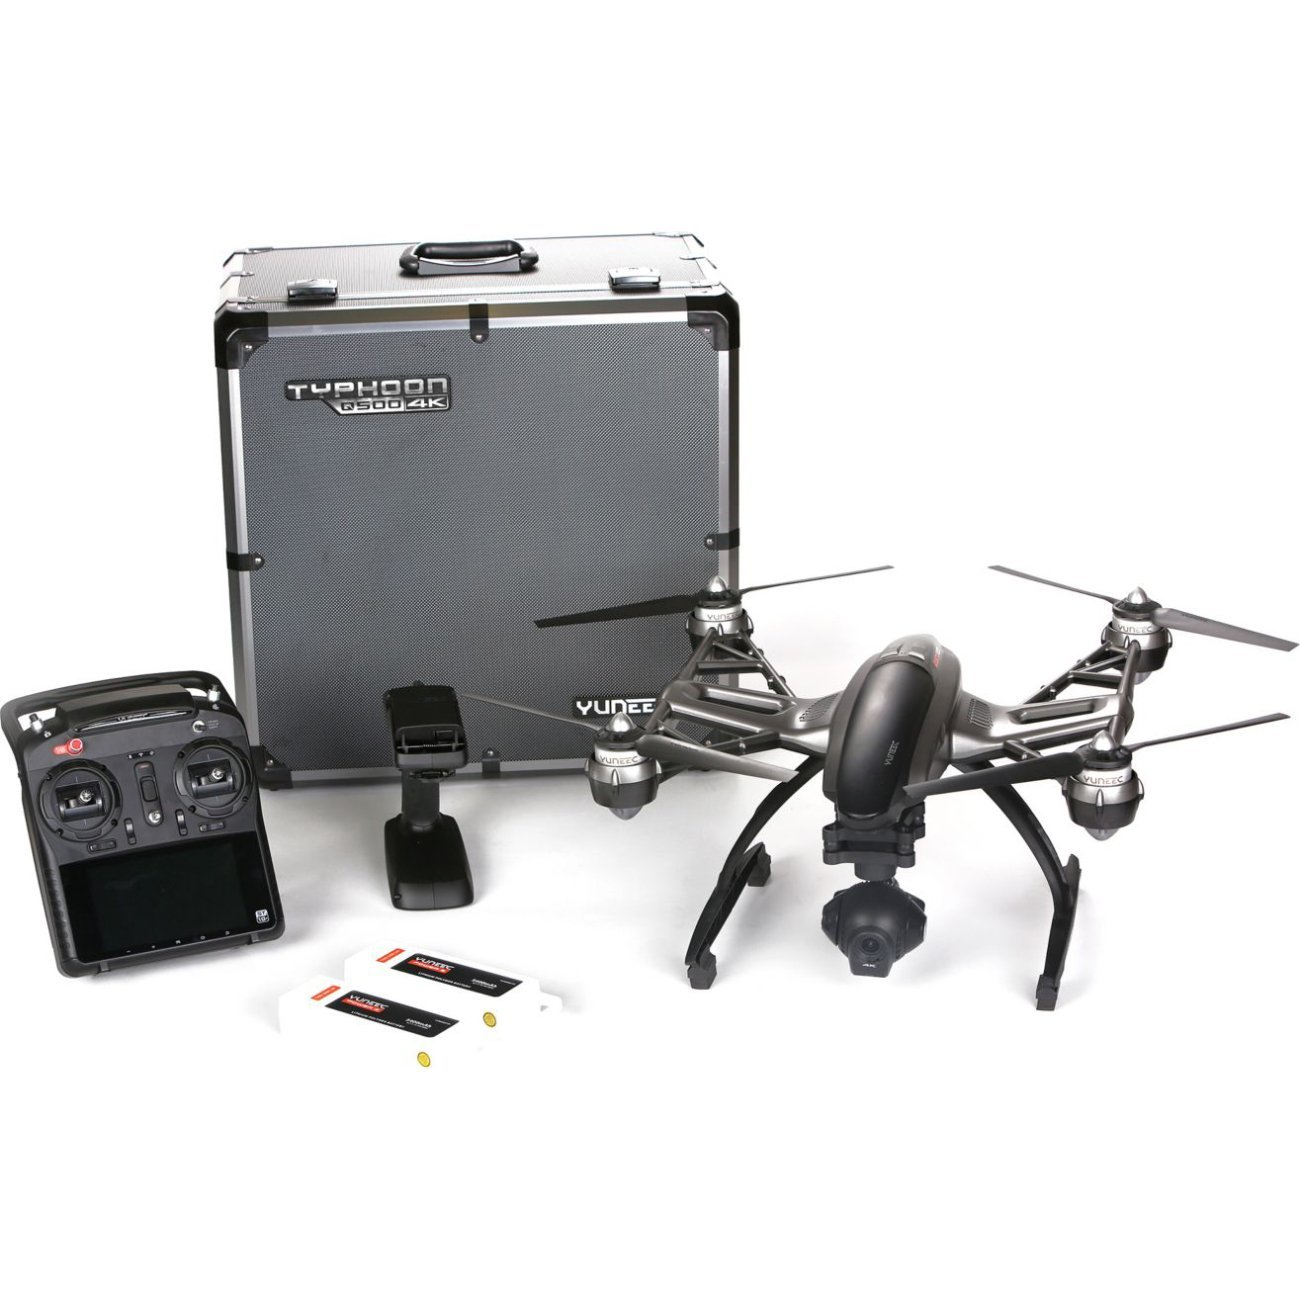 Yuneec Q500 4K Typhoon Quadcopter Drone RTF in Aluminum Case...